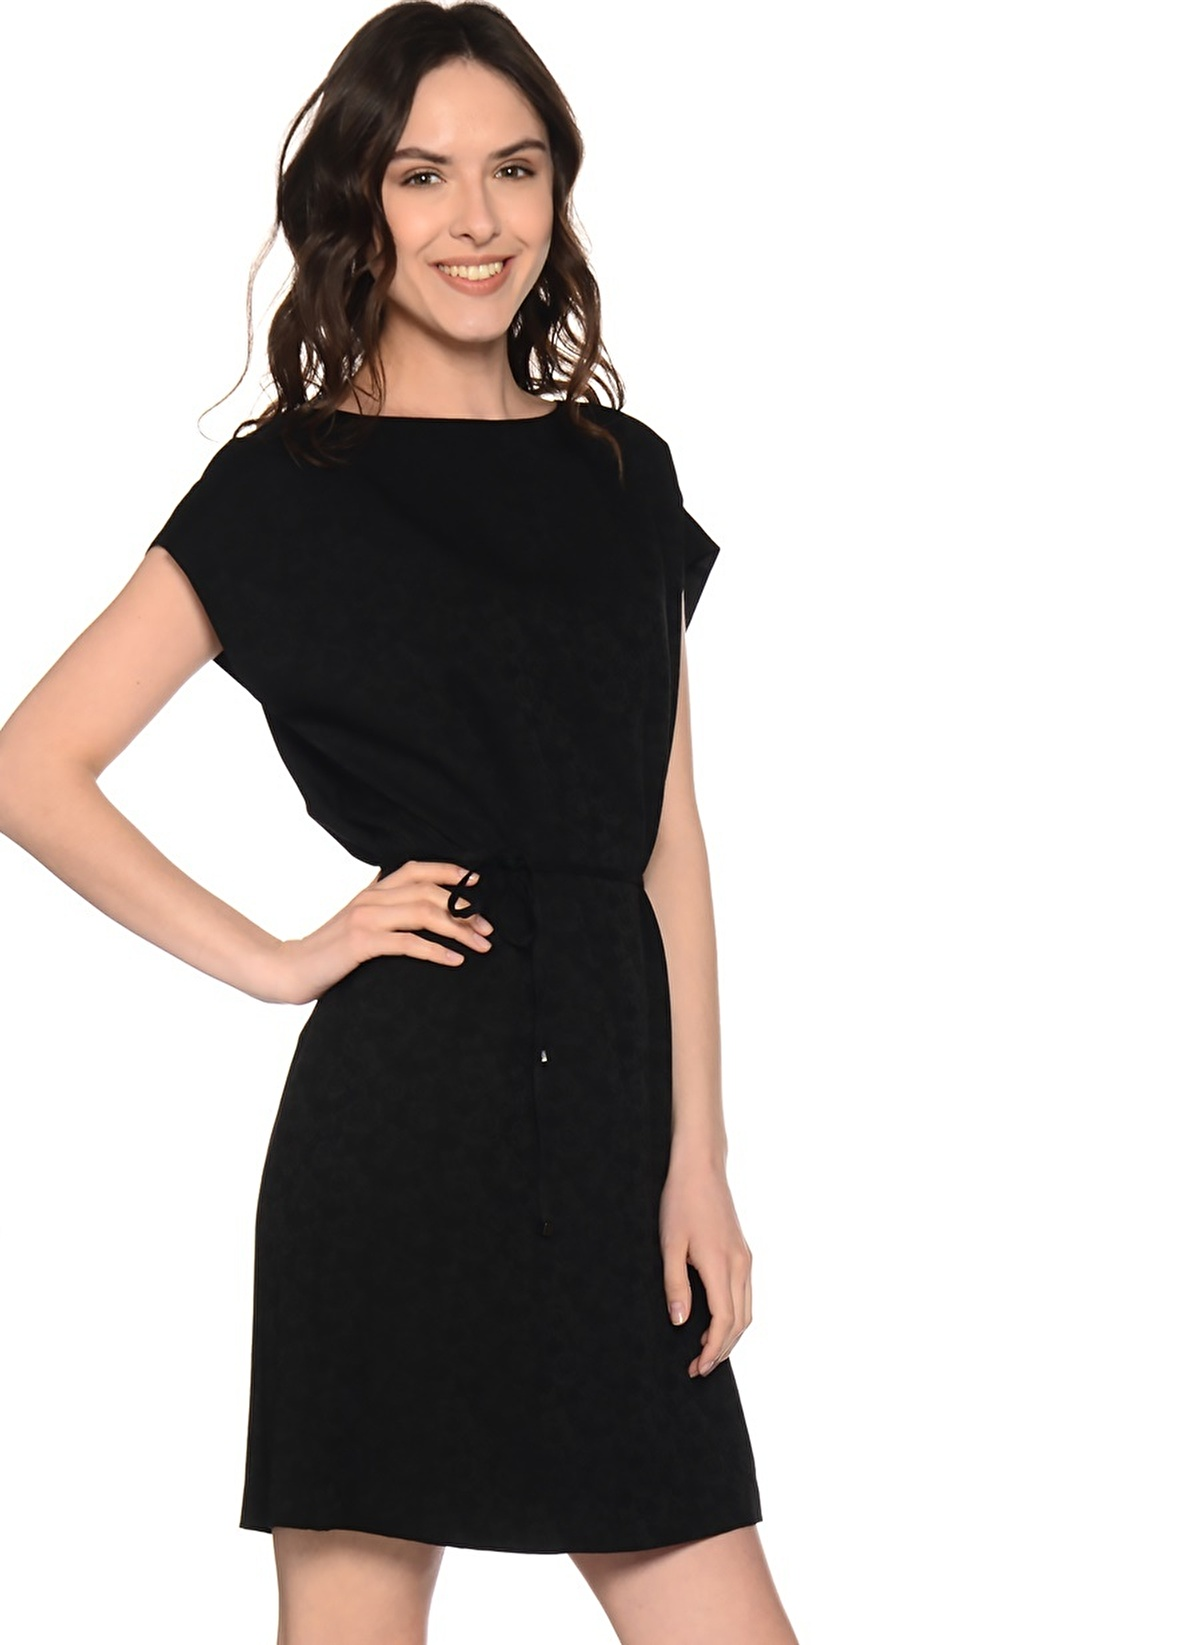 69ca6a8f152f7 Fabrika Kadın Yarım Kollu Günlük Kısa Elbise Siyah | Morhipo | 18896063